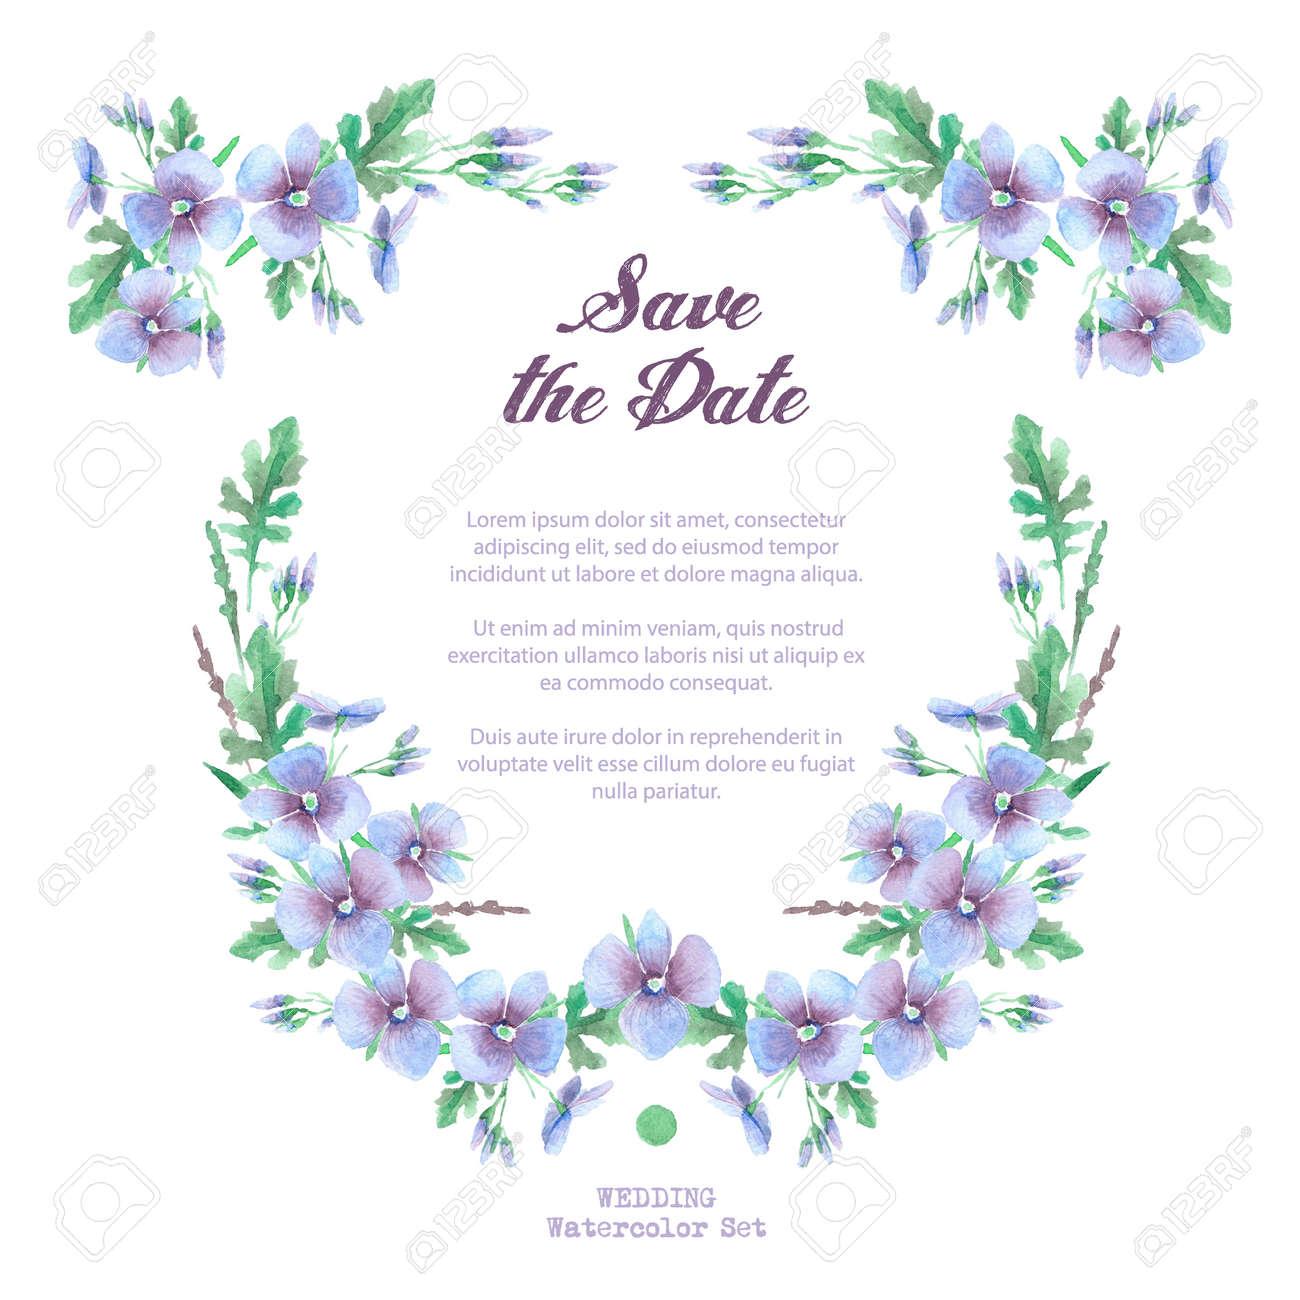 Purple hydrangea wedding invitation sample - Template For Celebration Wedding Invitation Blue Flowers Watercolor Blue Hydrangea Lavender